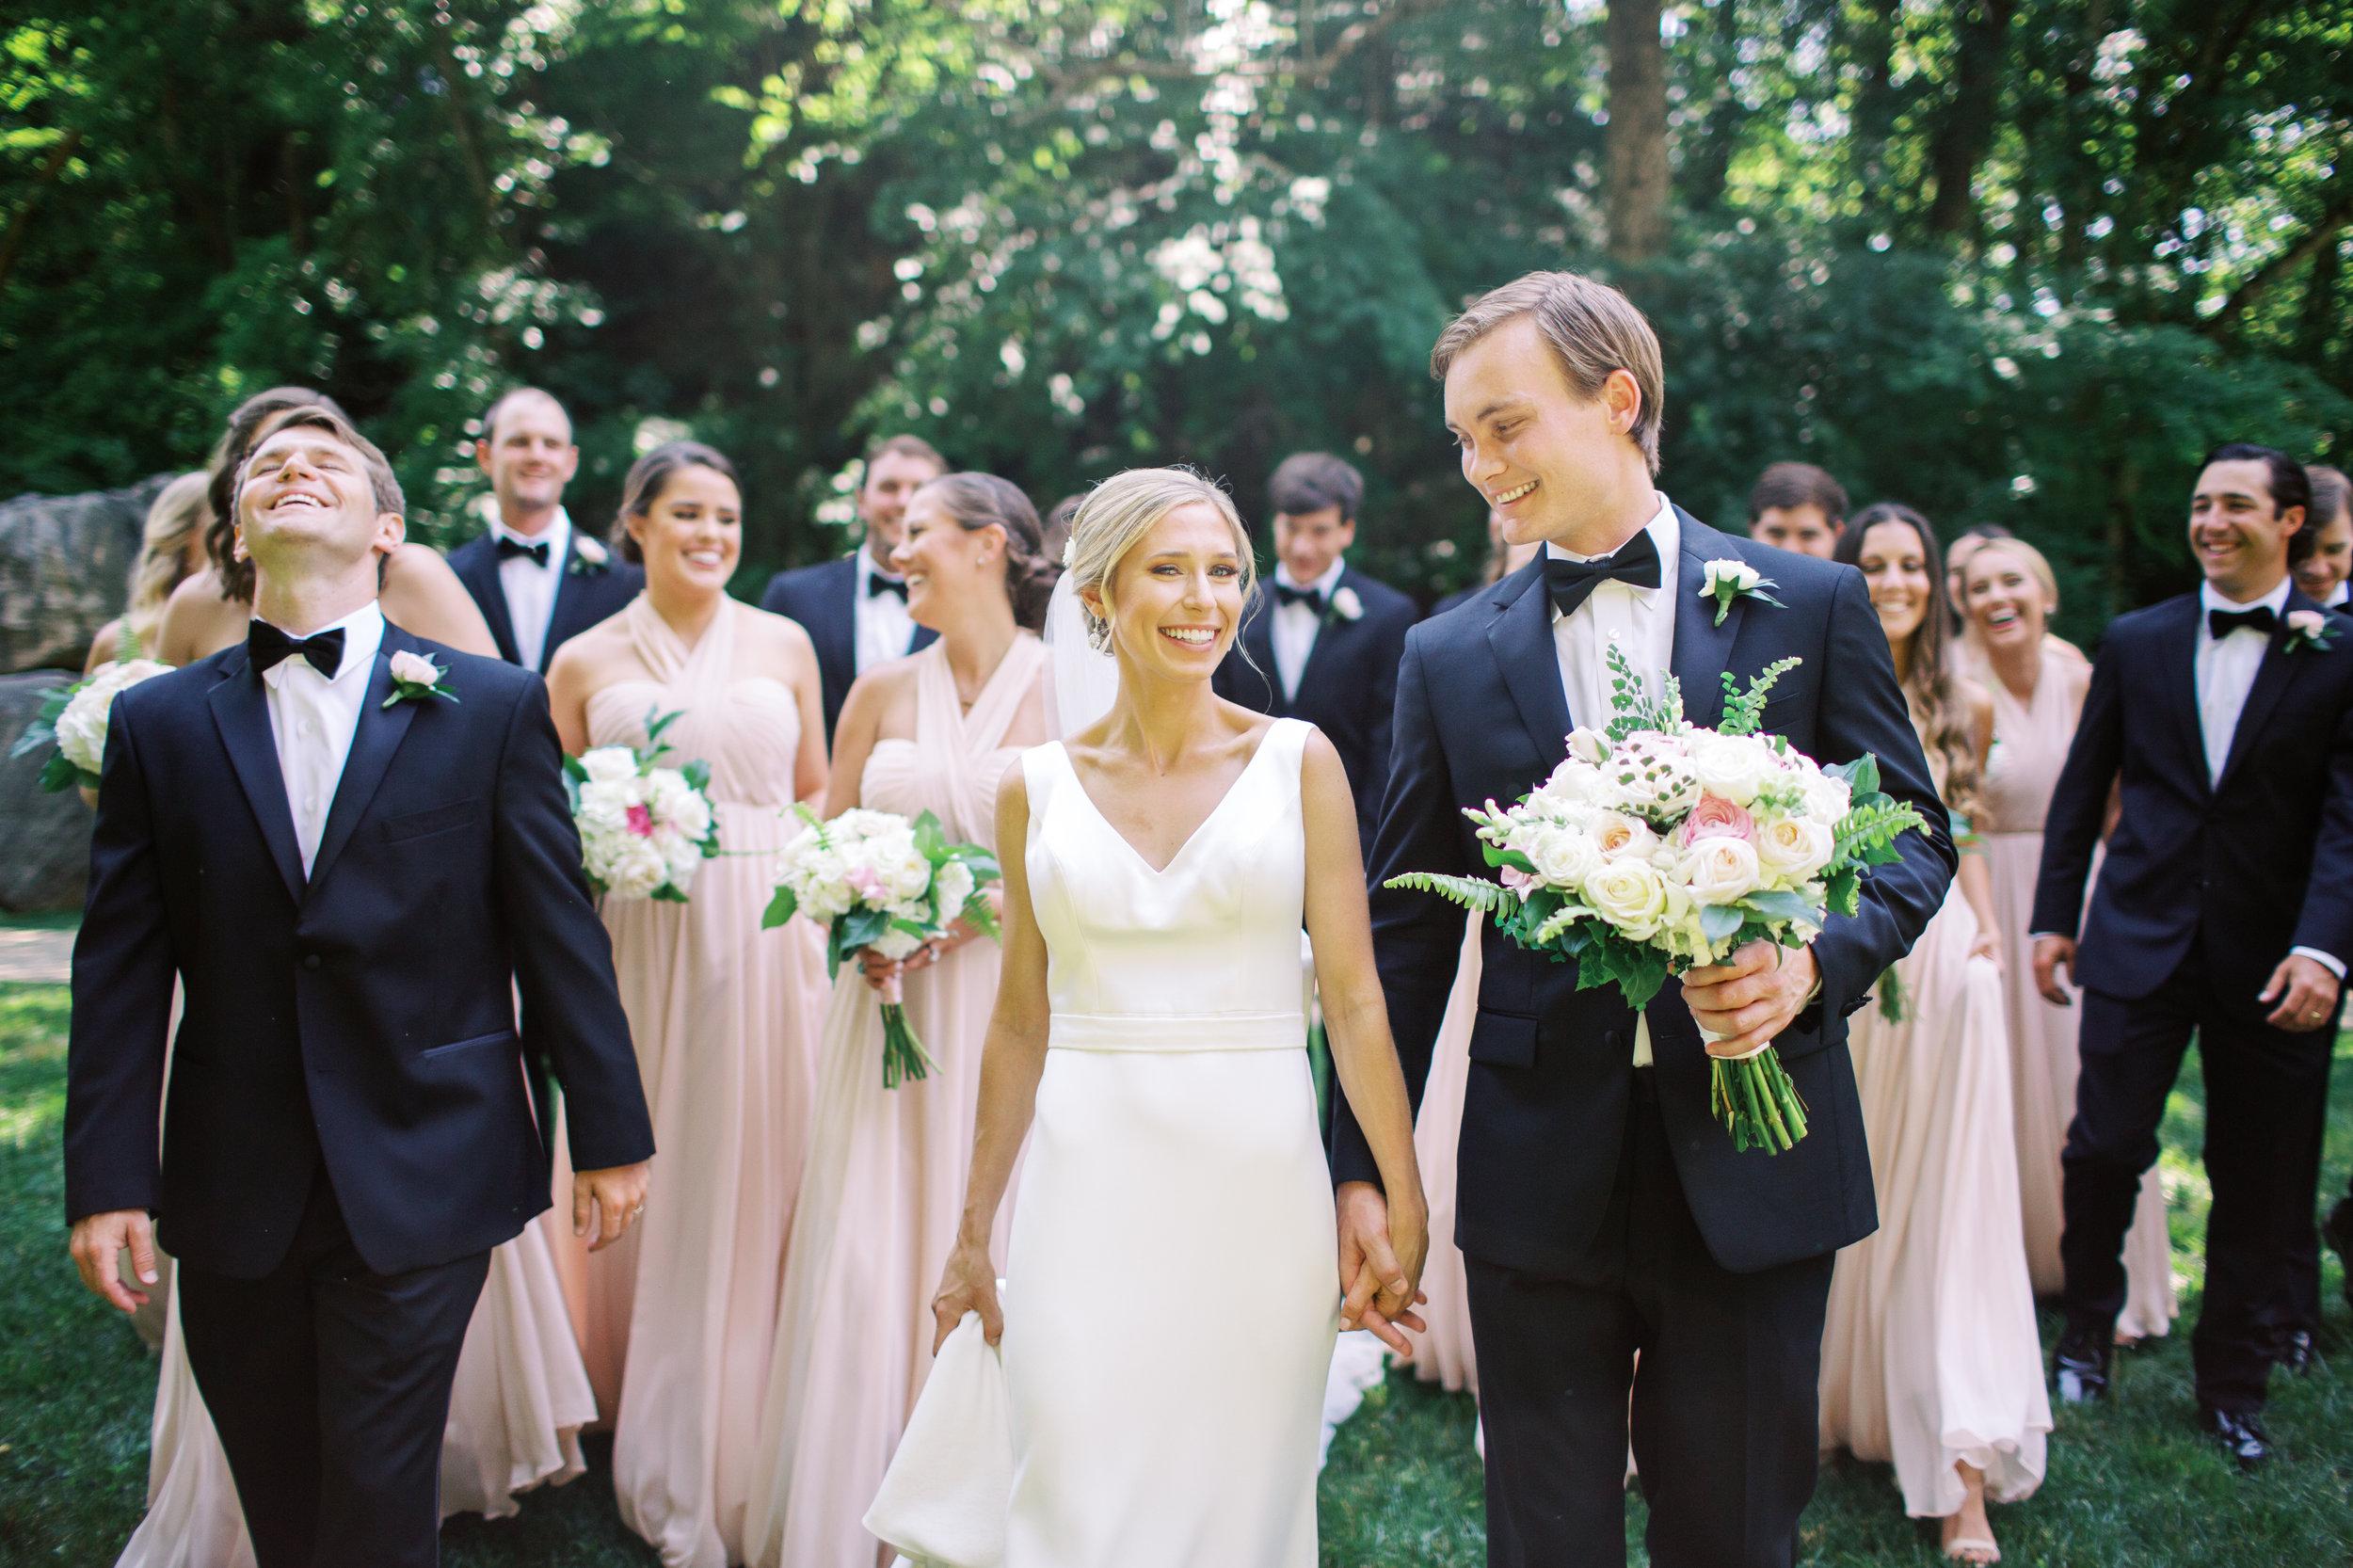 Olivia_Patrick_Wedding_Quarry_Venue_Abigail_Malone_Photography_Knoxville-319.jpg